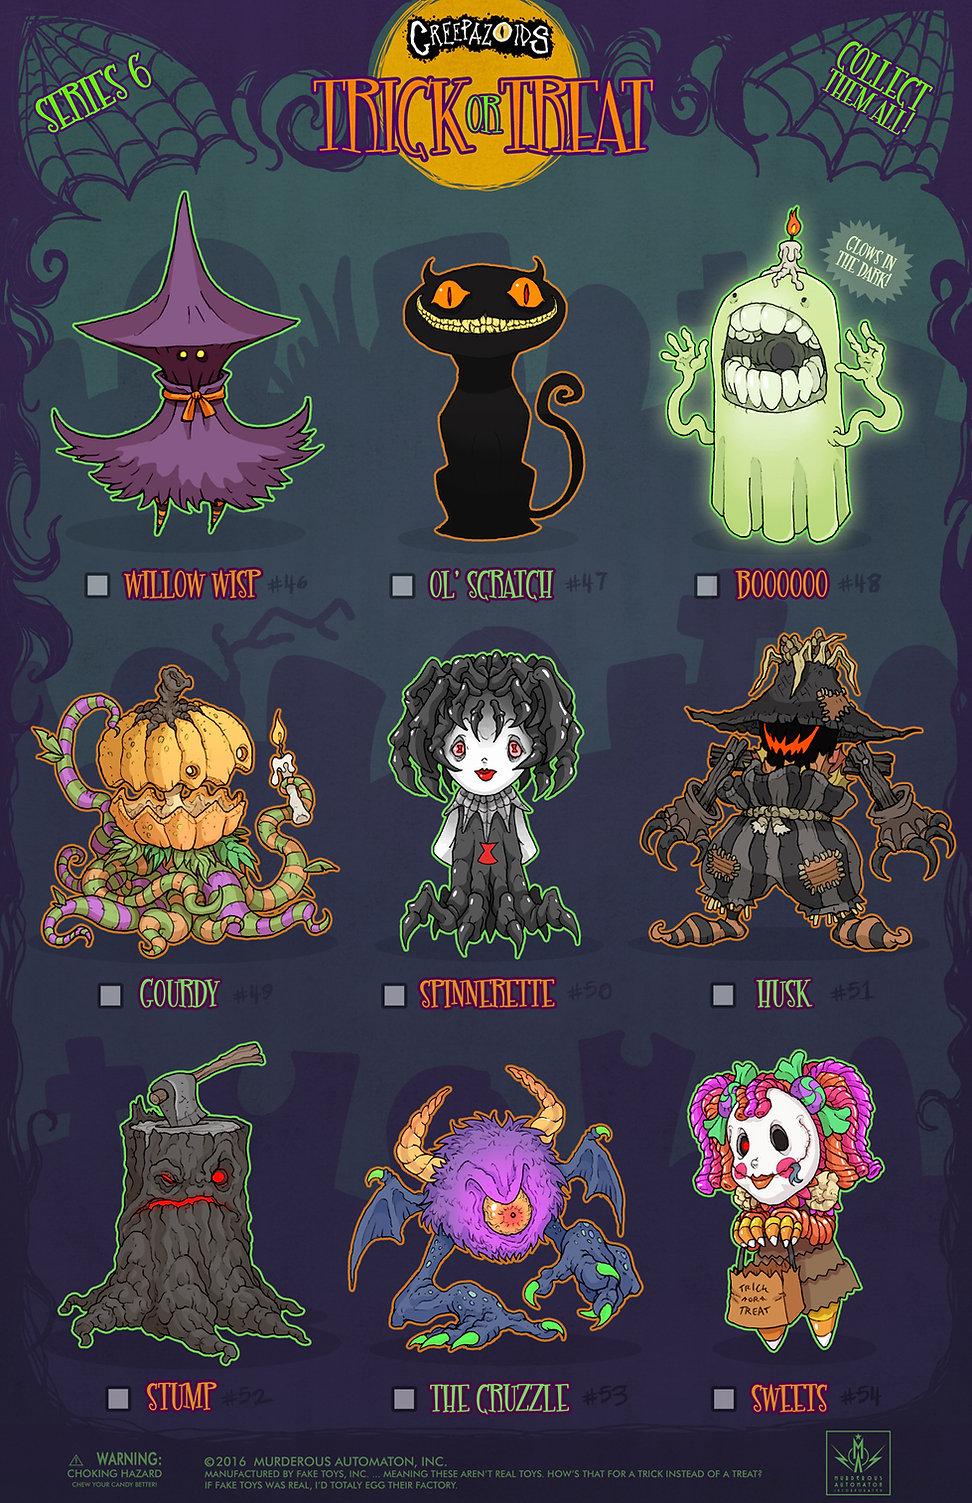 06 Creepazoids--Trick or Treat.jpg